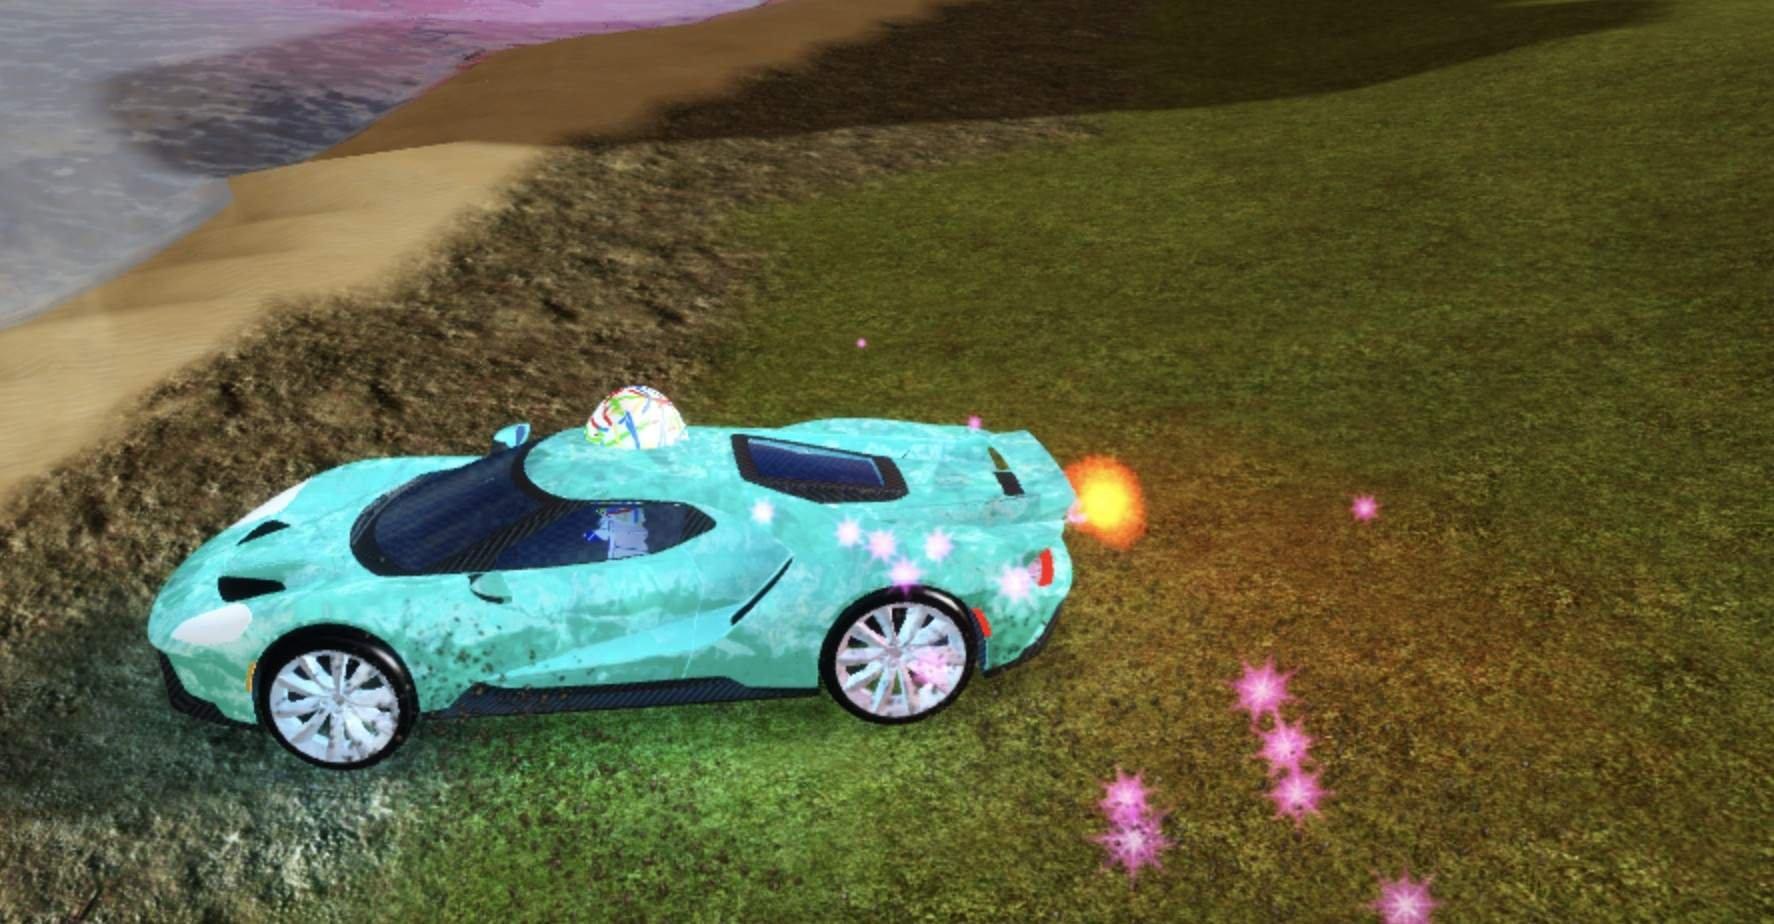 Roblox Vehicle Simulator Codes July 2020